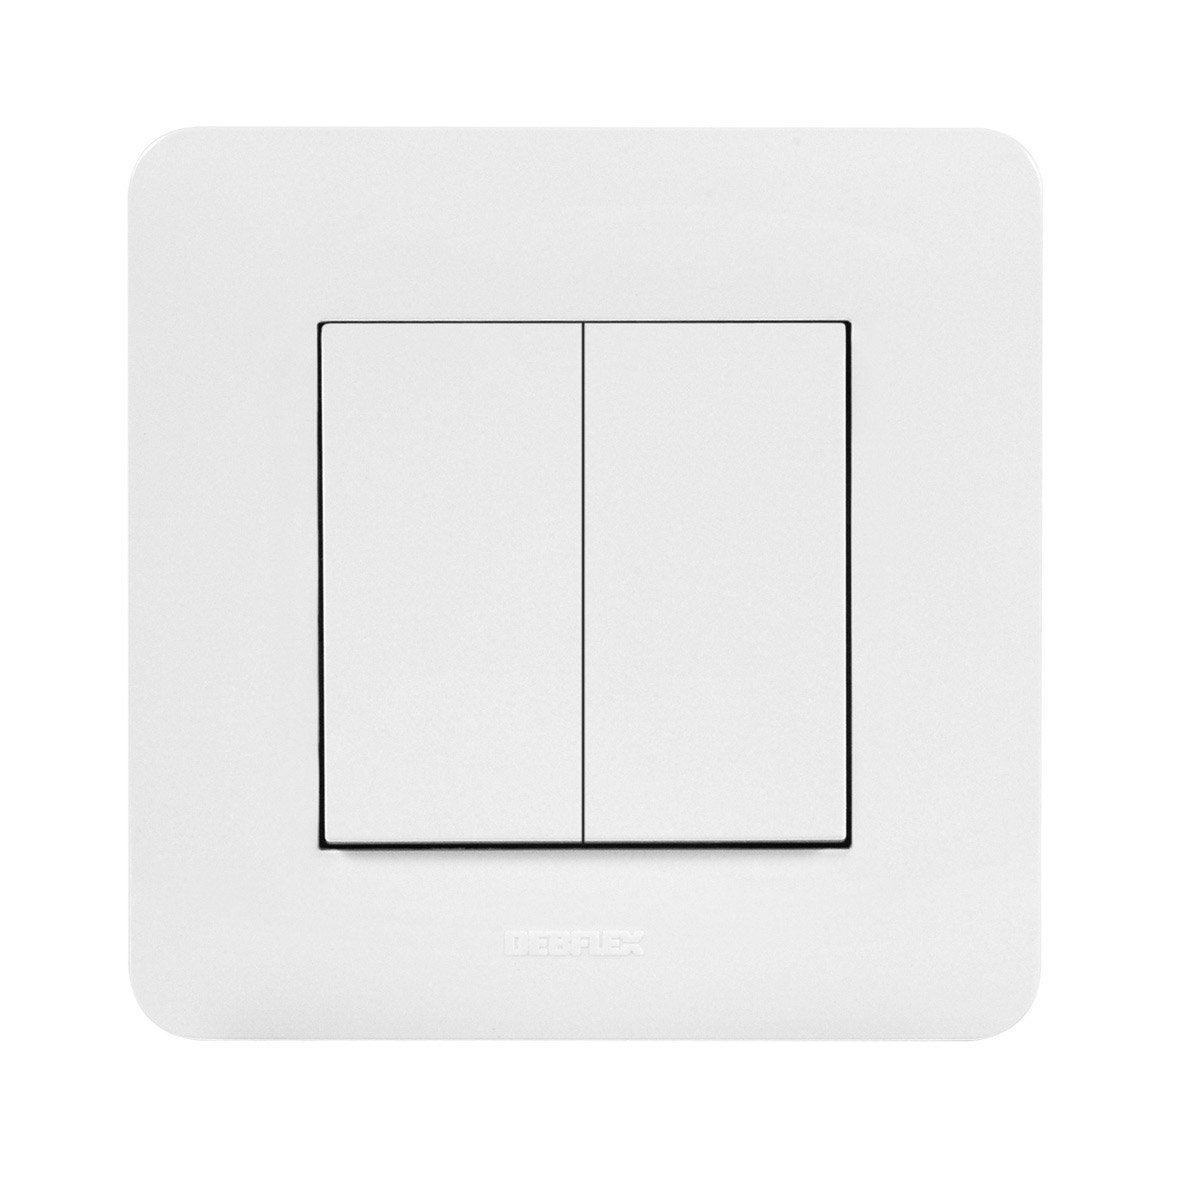 interrupteur connect blanc 2 boutons sans pile sans fil enocean debflex leroy merlin. Black Bedroom Furniture Sets. Home Design Ideas